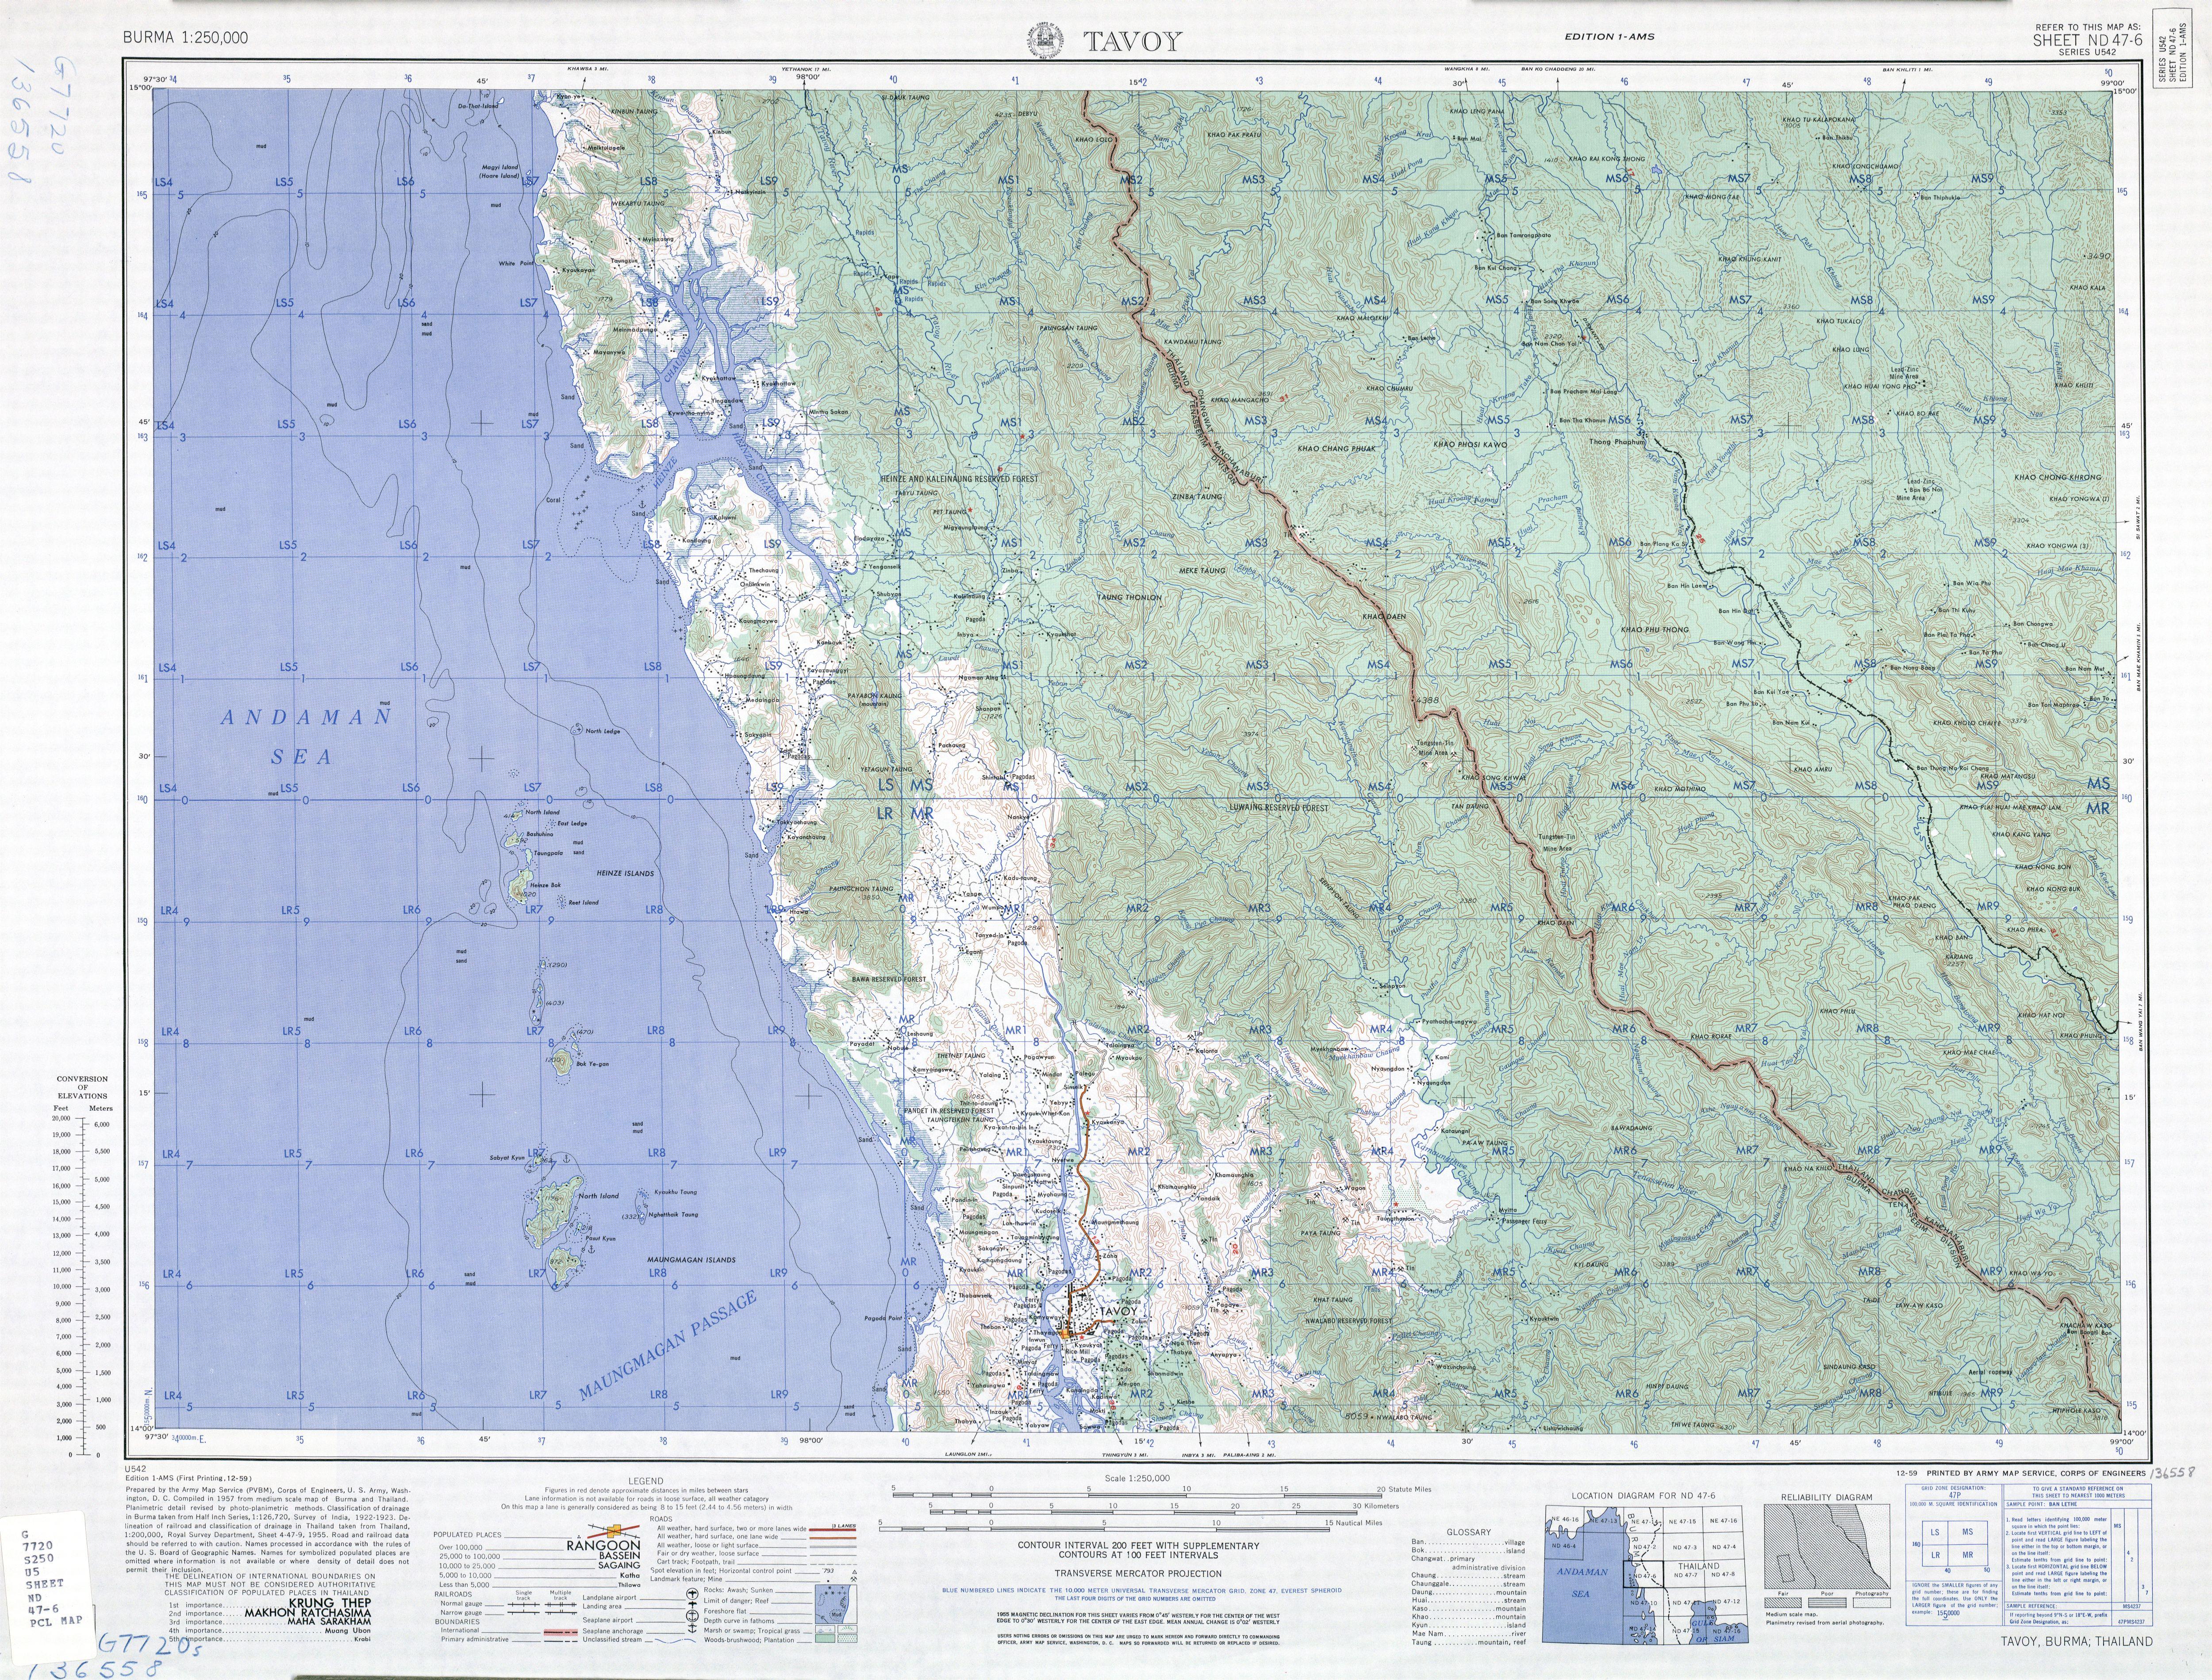 Electrical Industry Of Burma Myanmar 4525d1218112413tgeneratorwiringpicture6jpg Http Libutexasedu Maps Ams Txu Oclc 6924198 Nd47 6